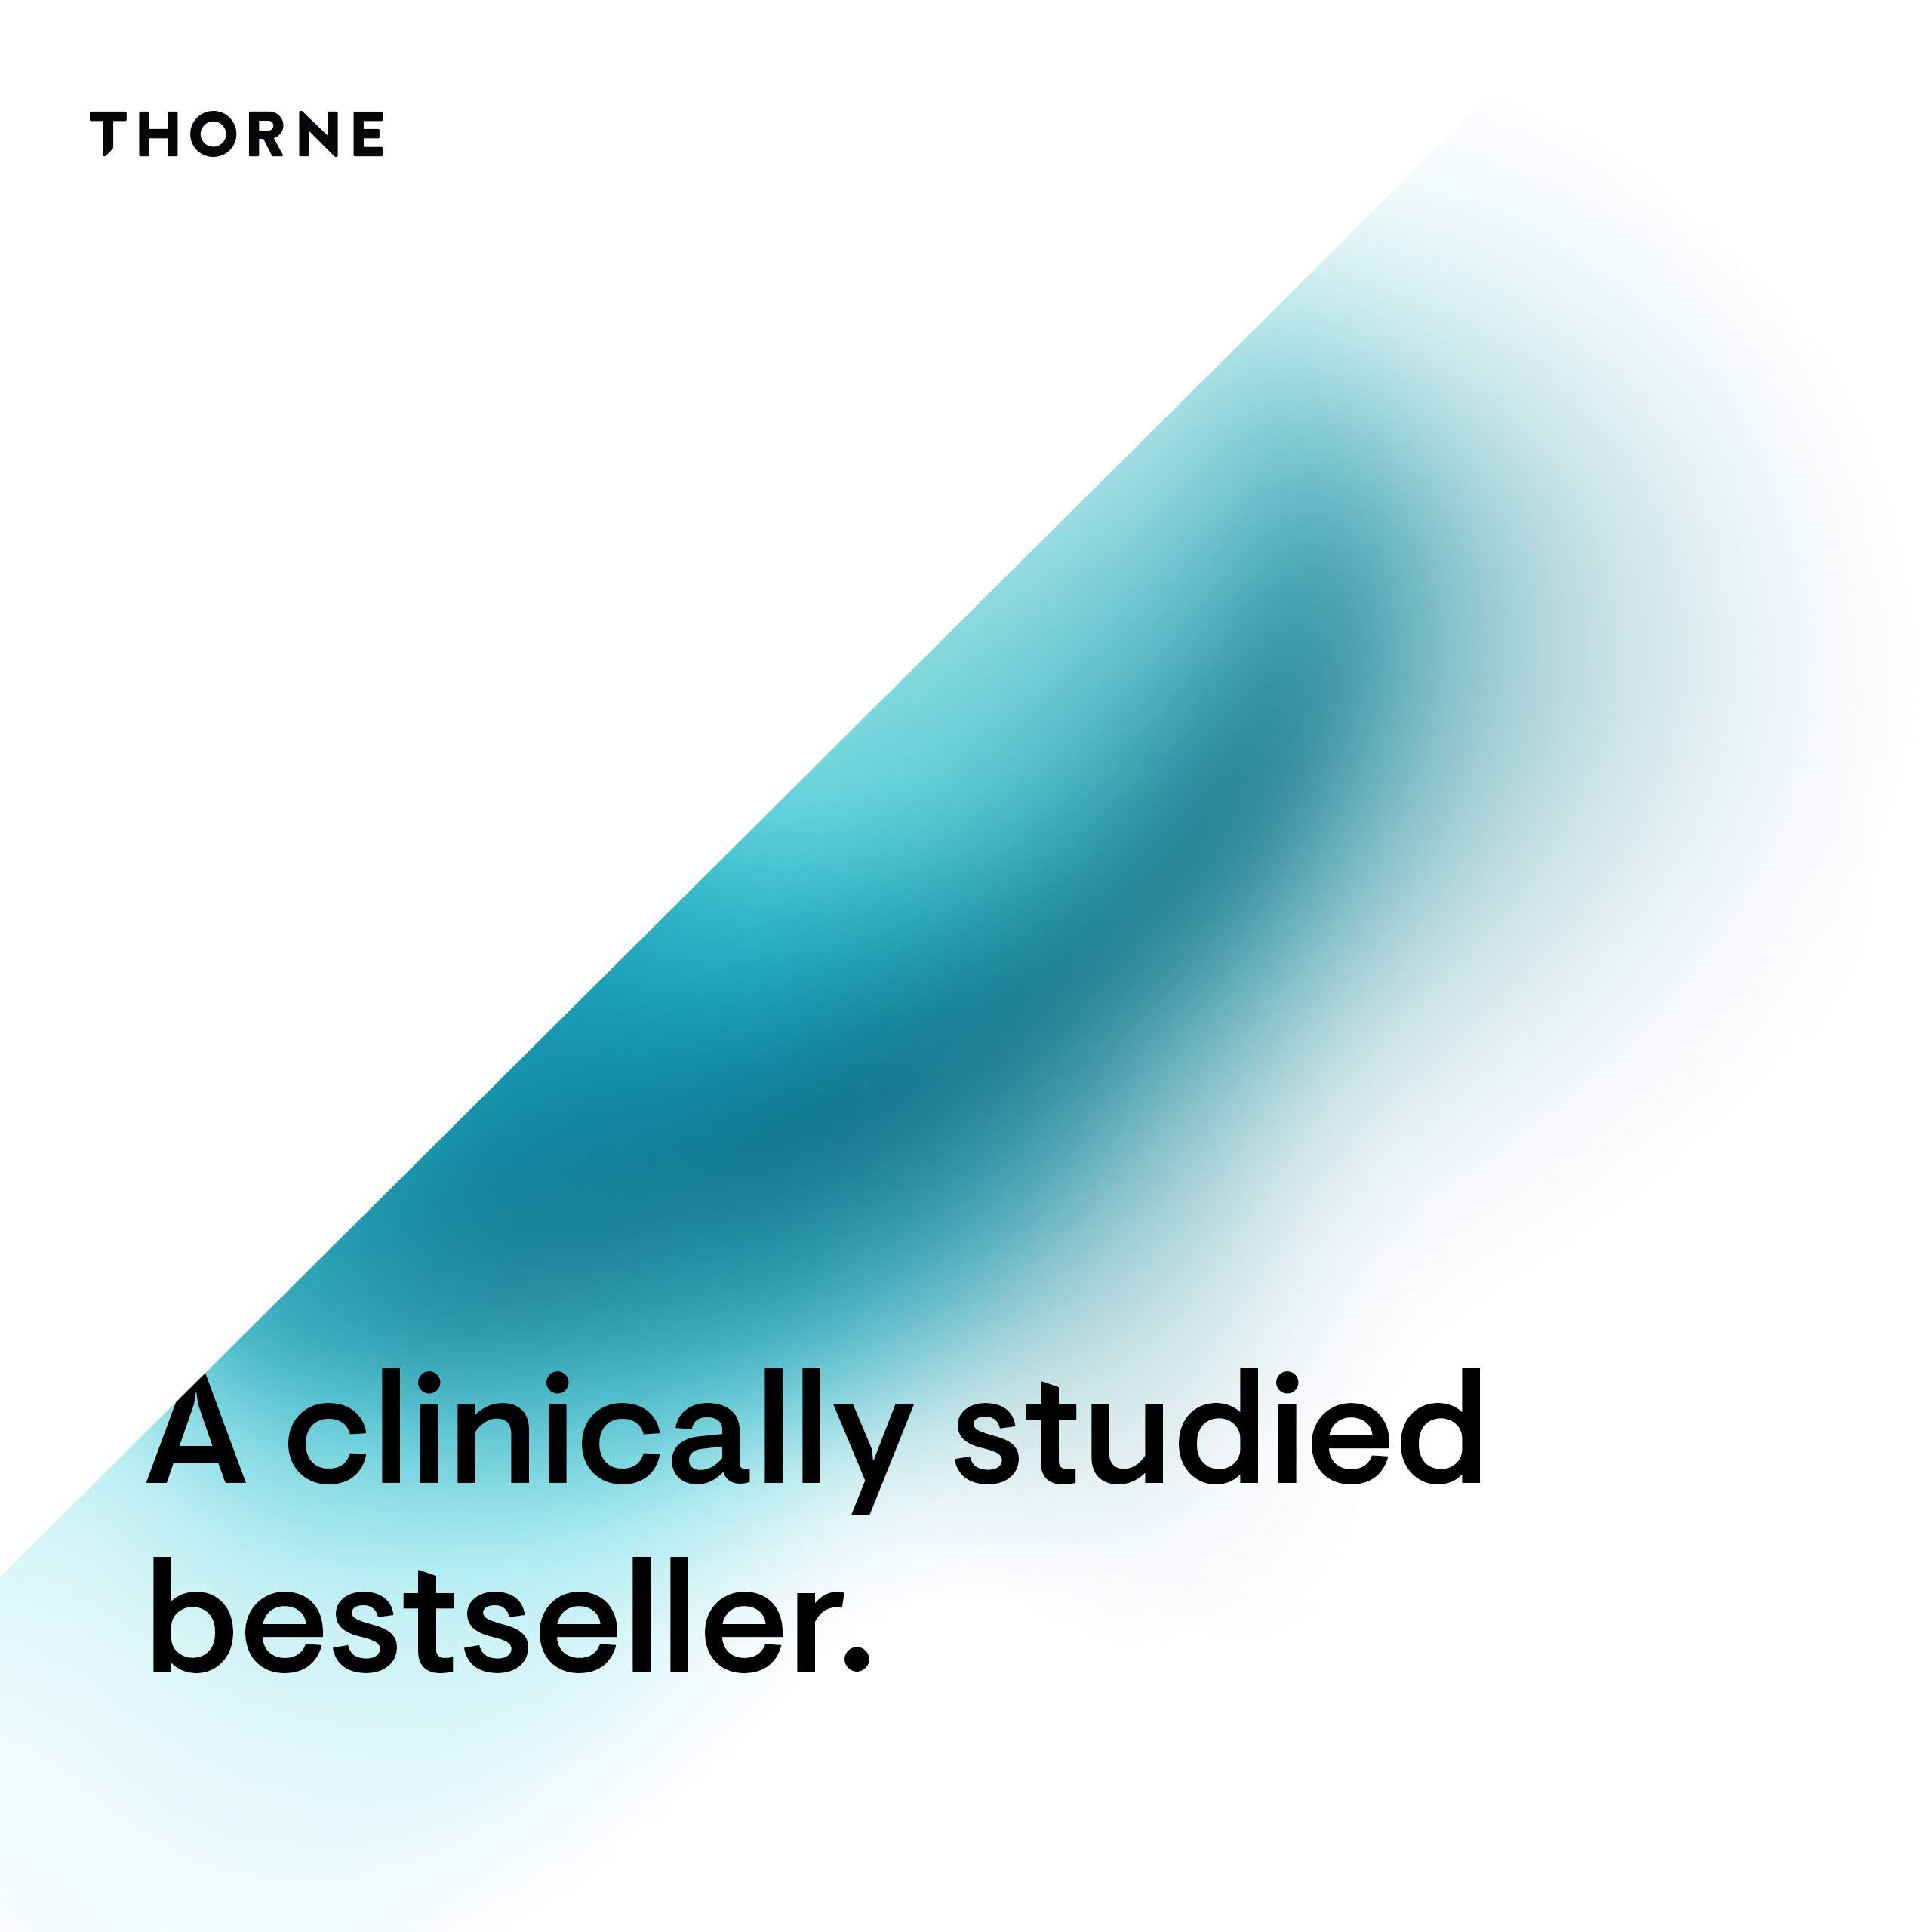 Thorne Research - Biotin 8 - Vitamin B7 (Biotin) for Healthy Hair, Nails, and Skin - 60 Capsules